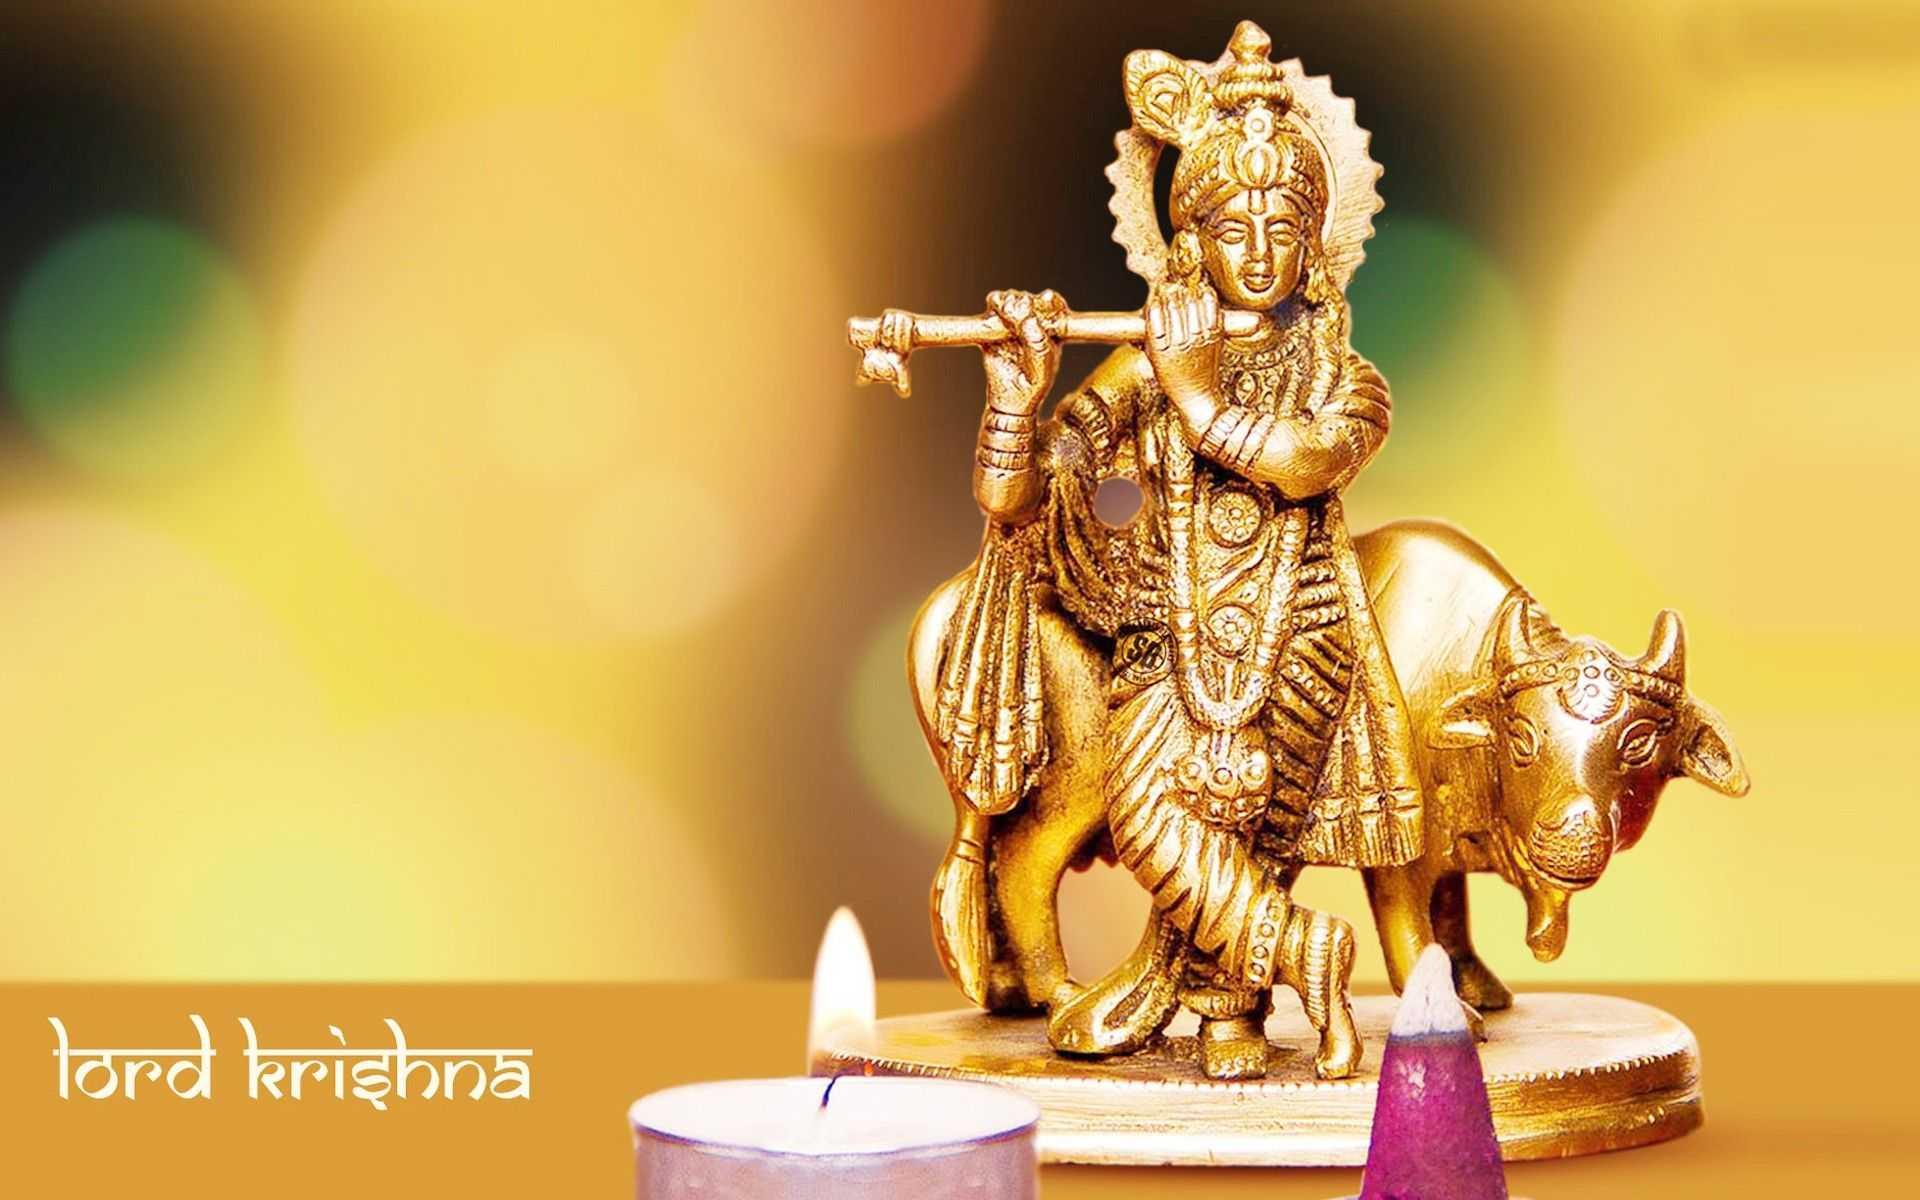 lord krishna images 2017